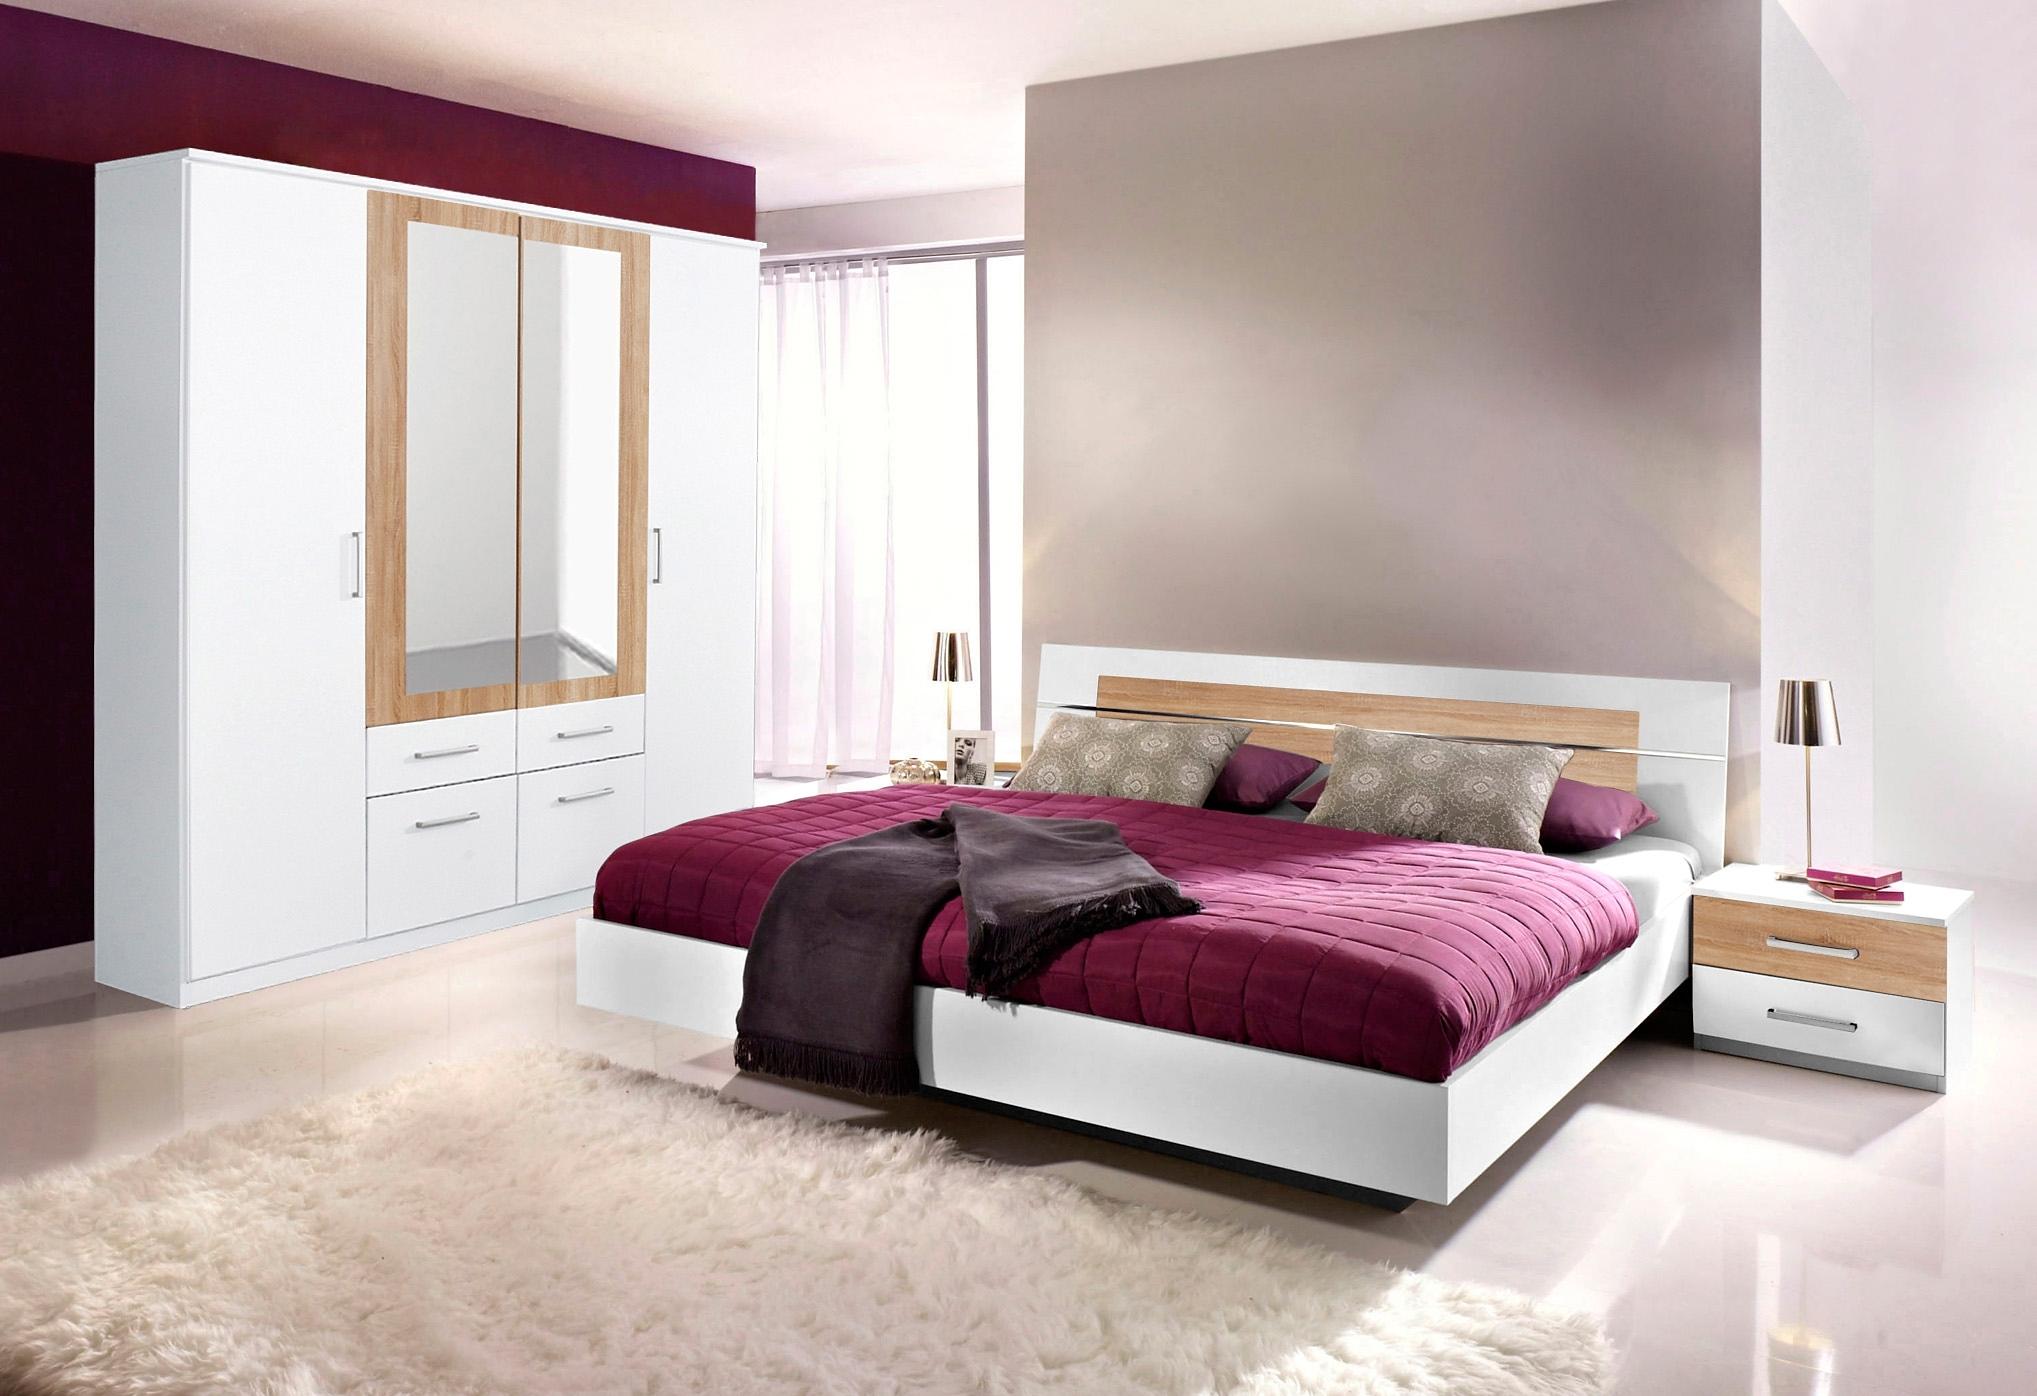 afbeeldingsbron rauch slaapkamer 4 dlg